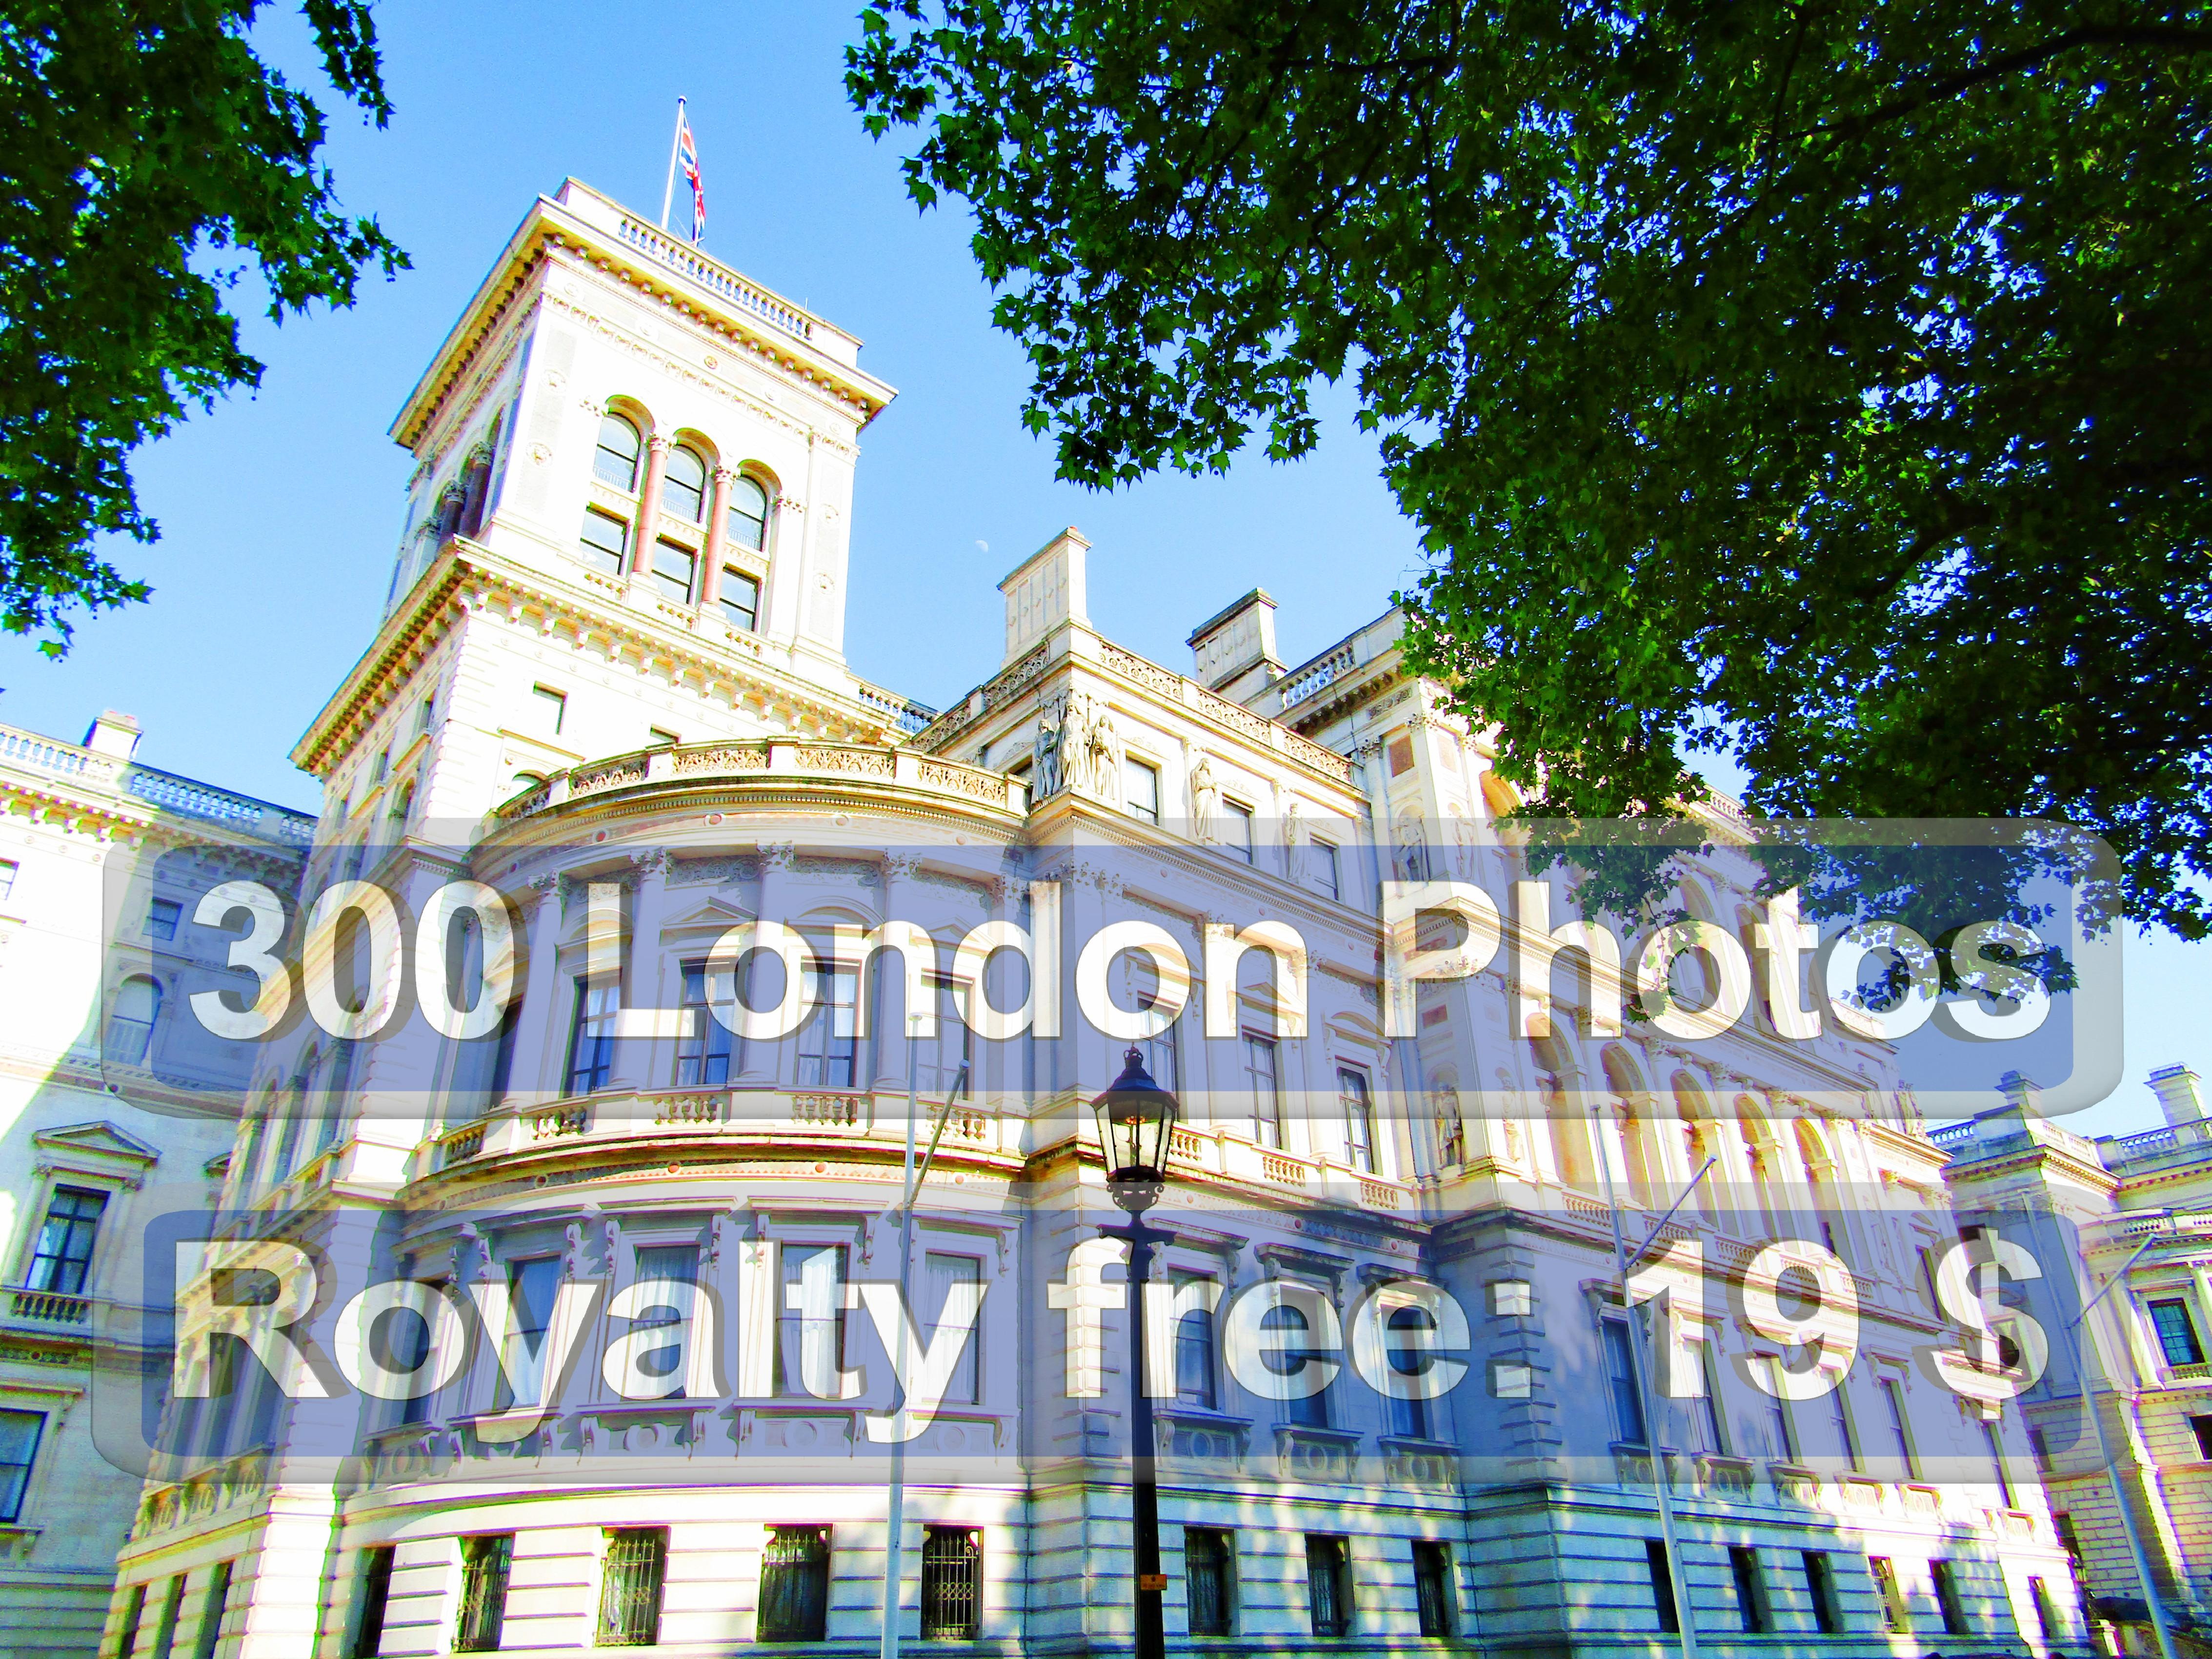 London Jogger Photo